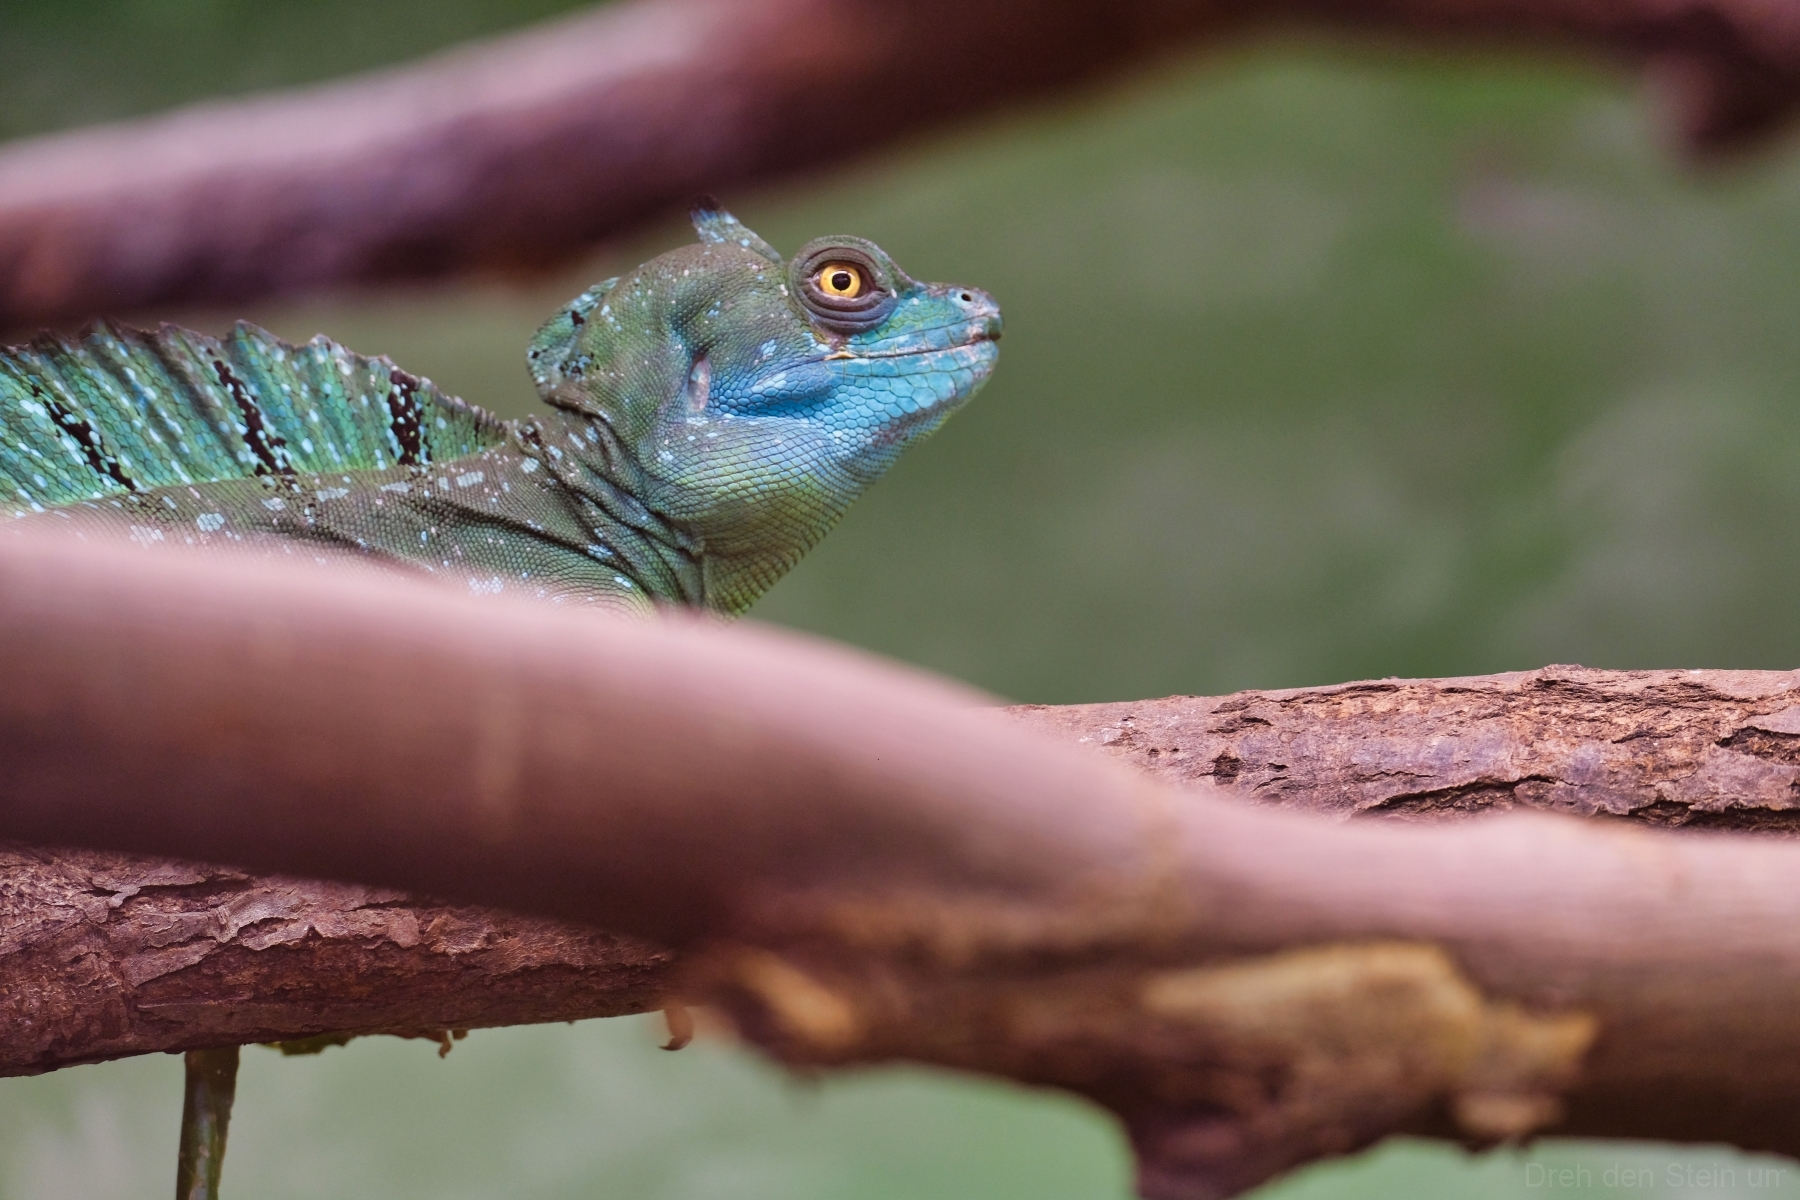 Reptiliengehege